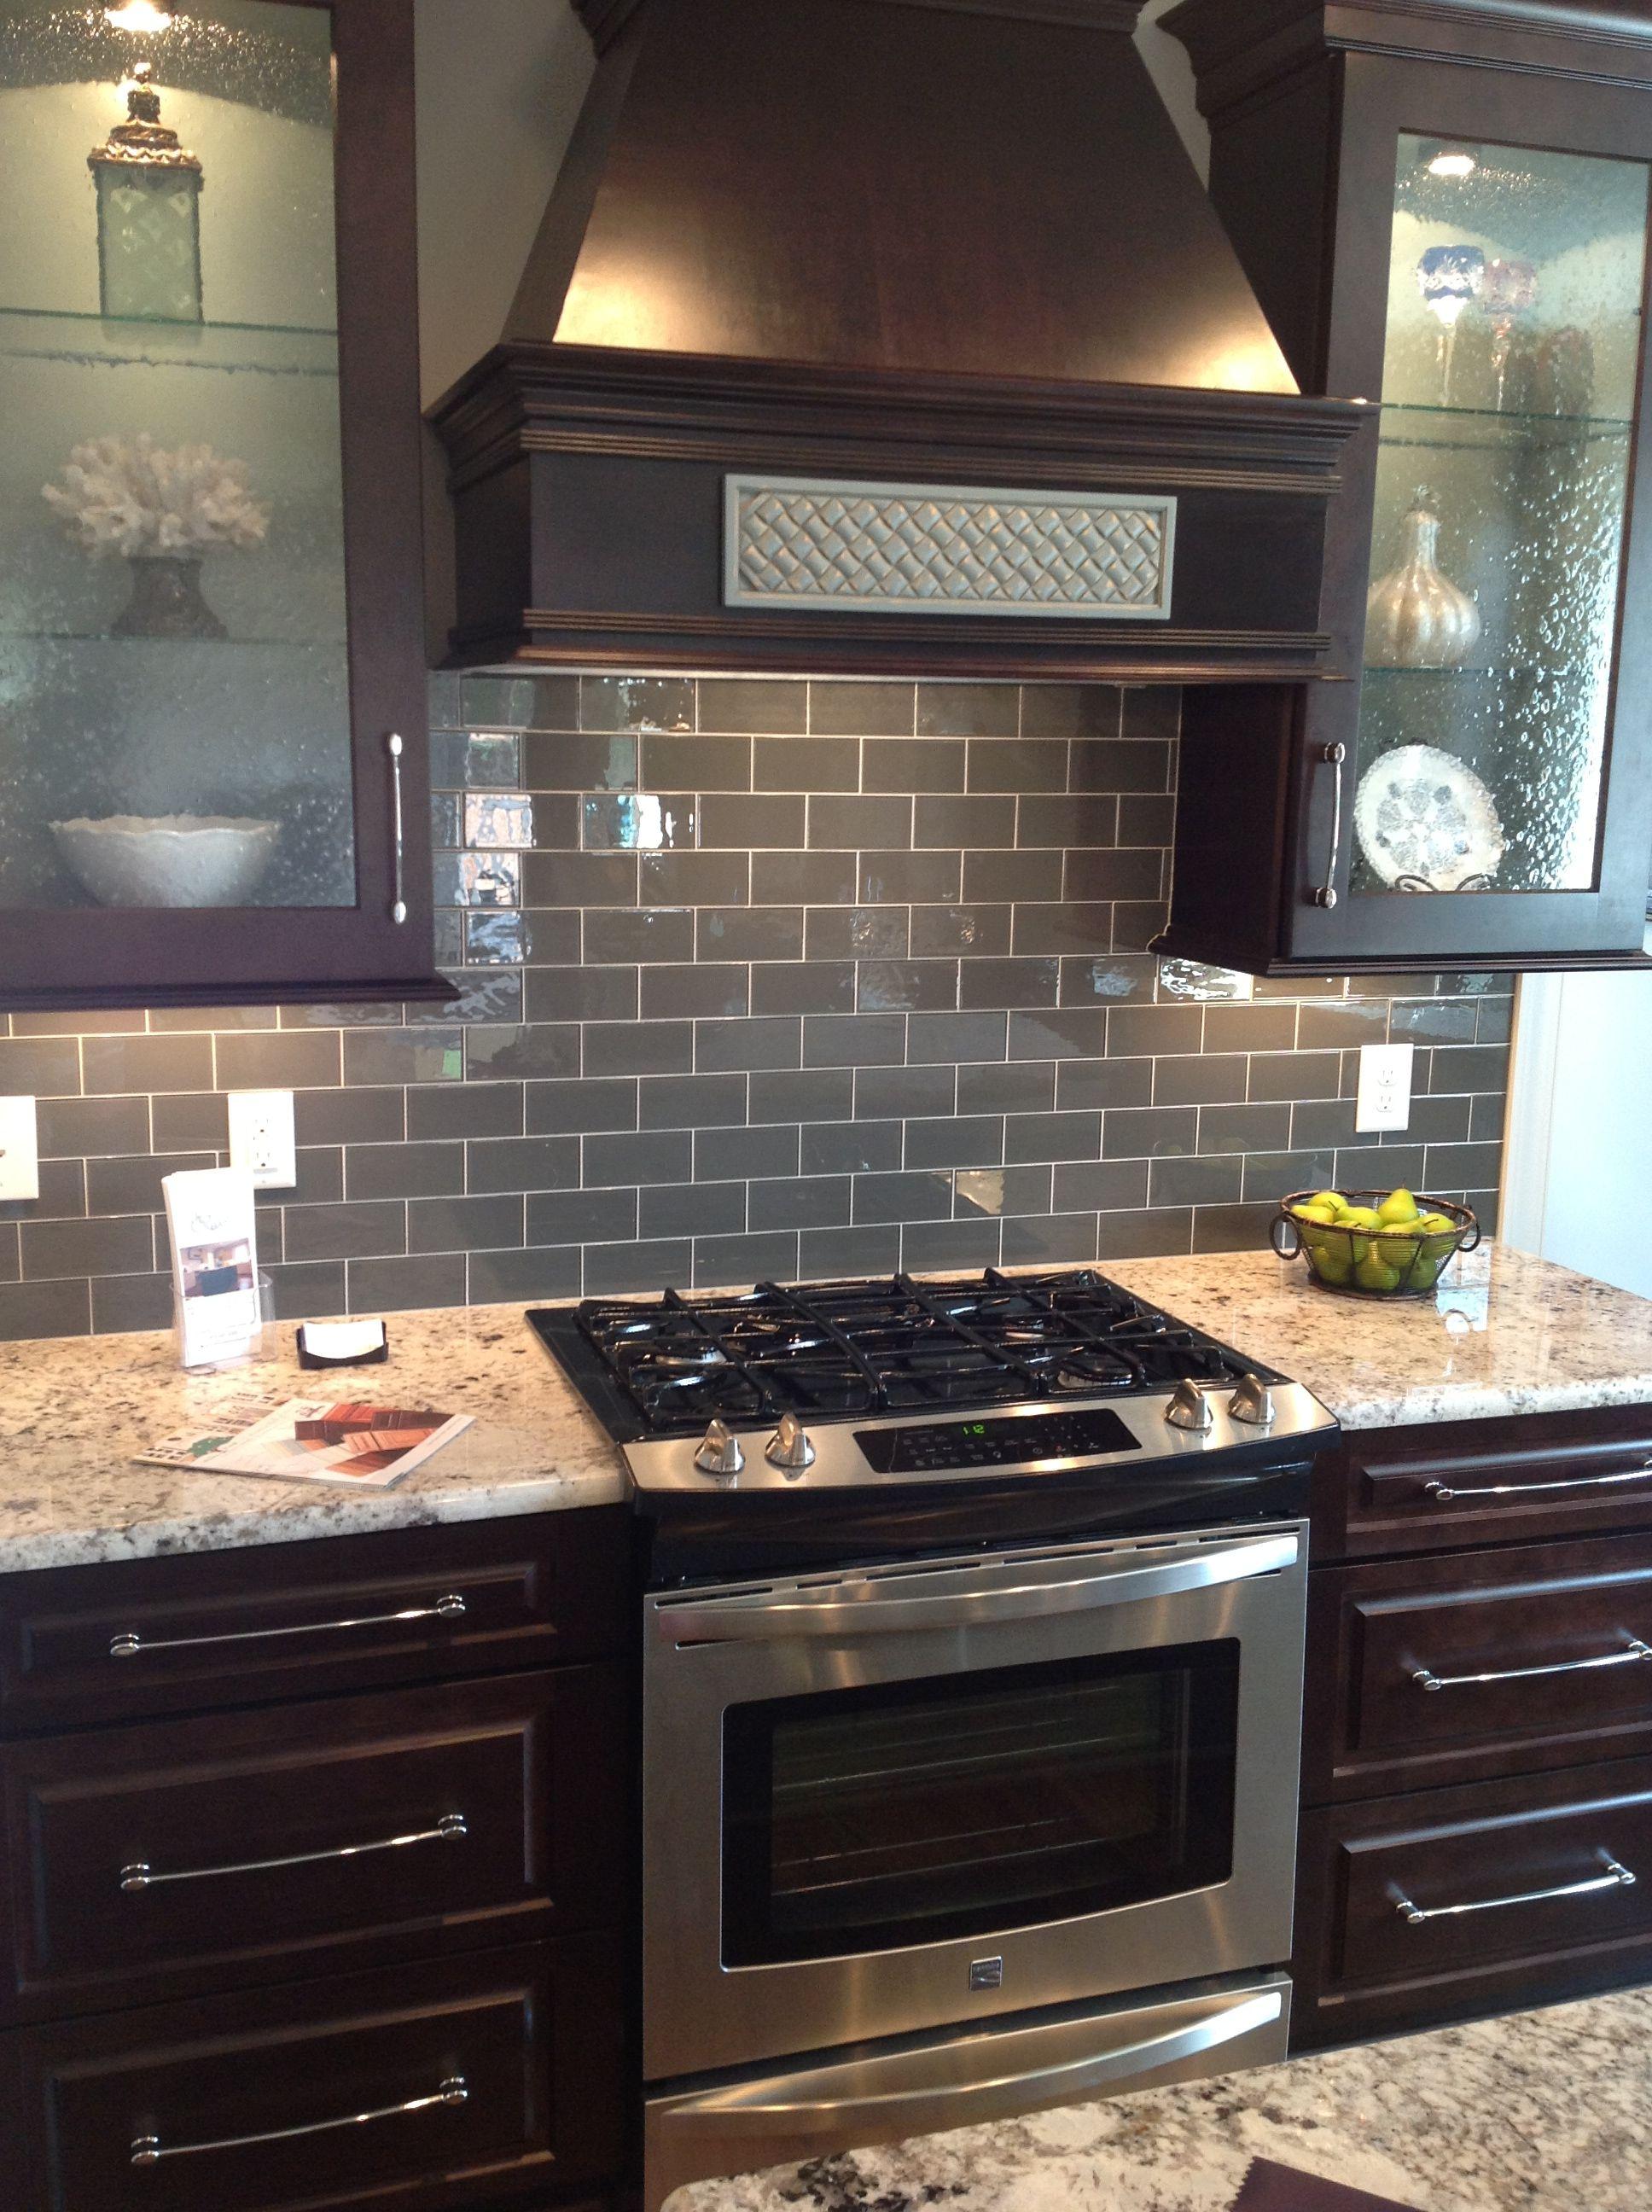 gray kitchen backsplash cabinets knoxville tn ice glass subway tile dark brown